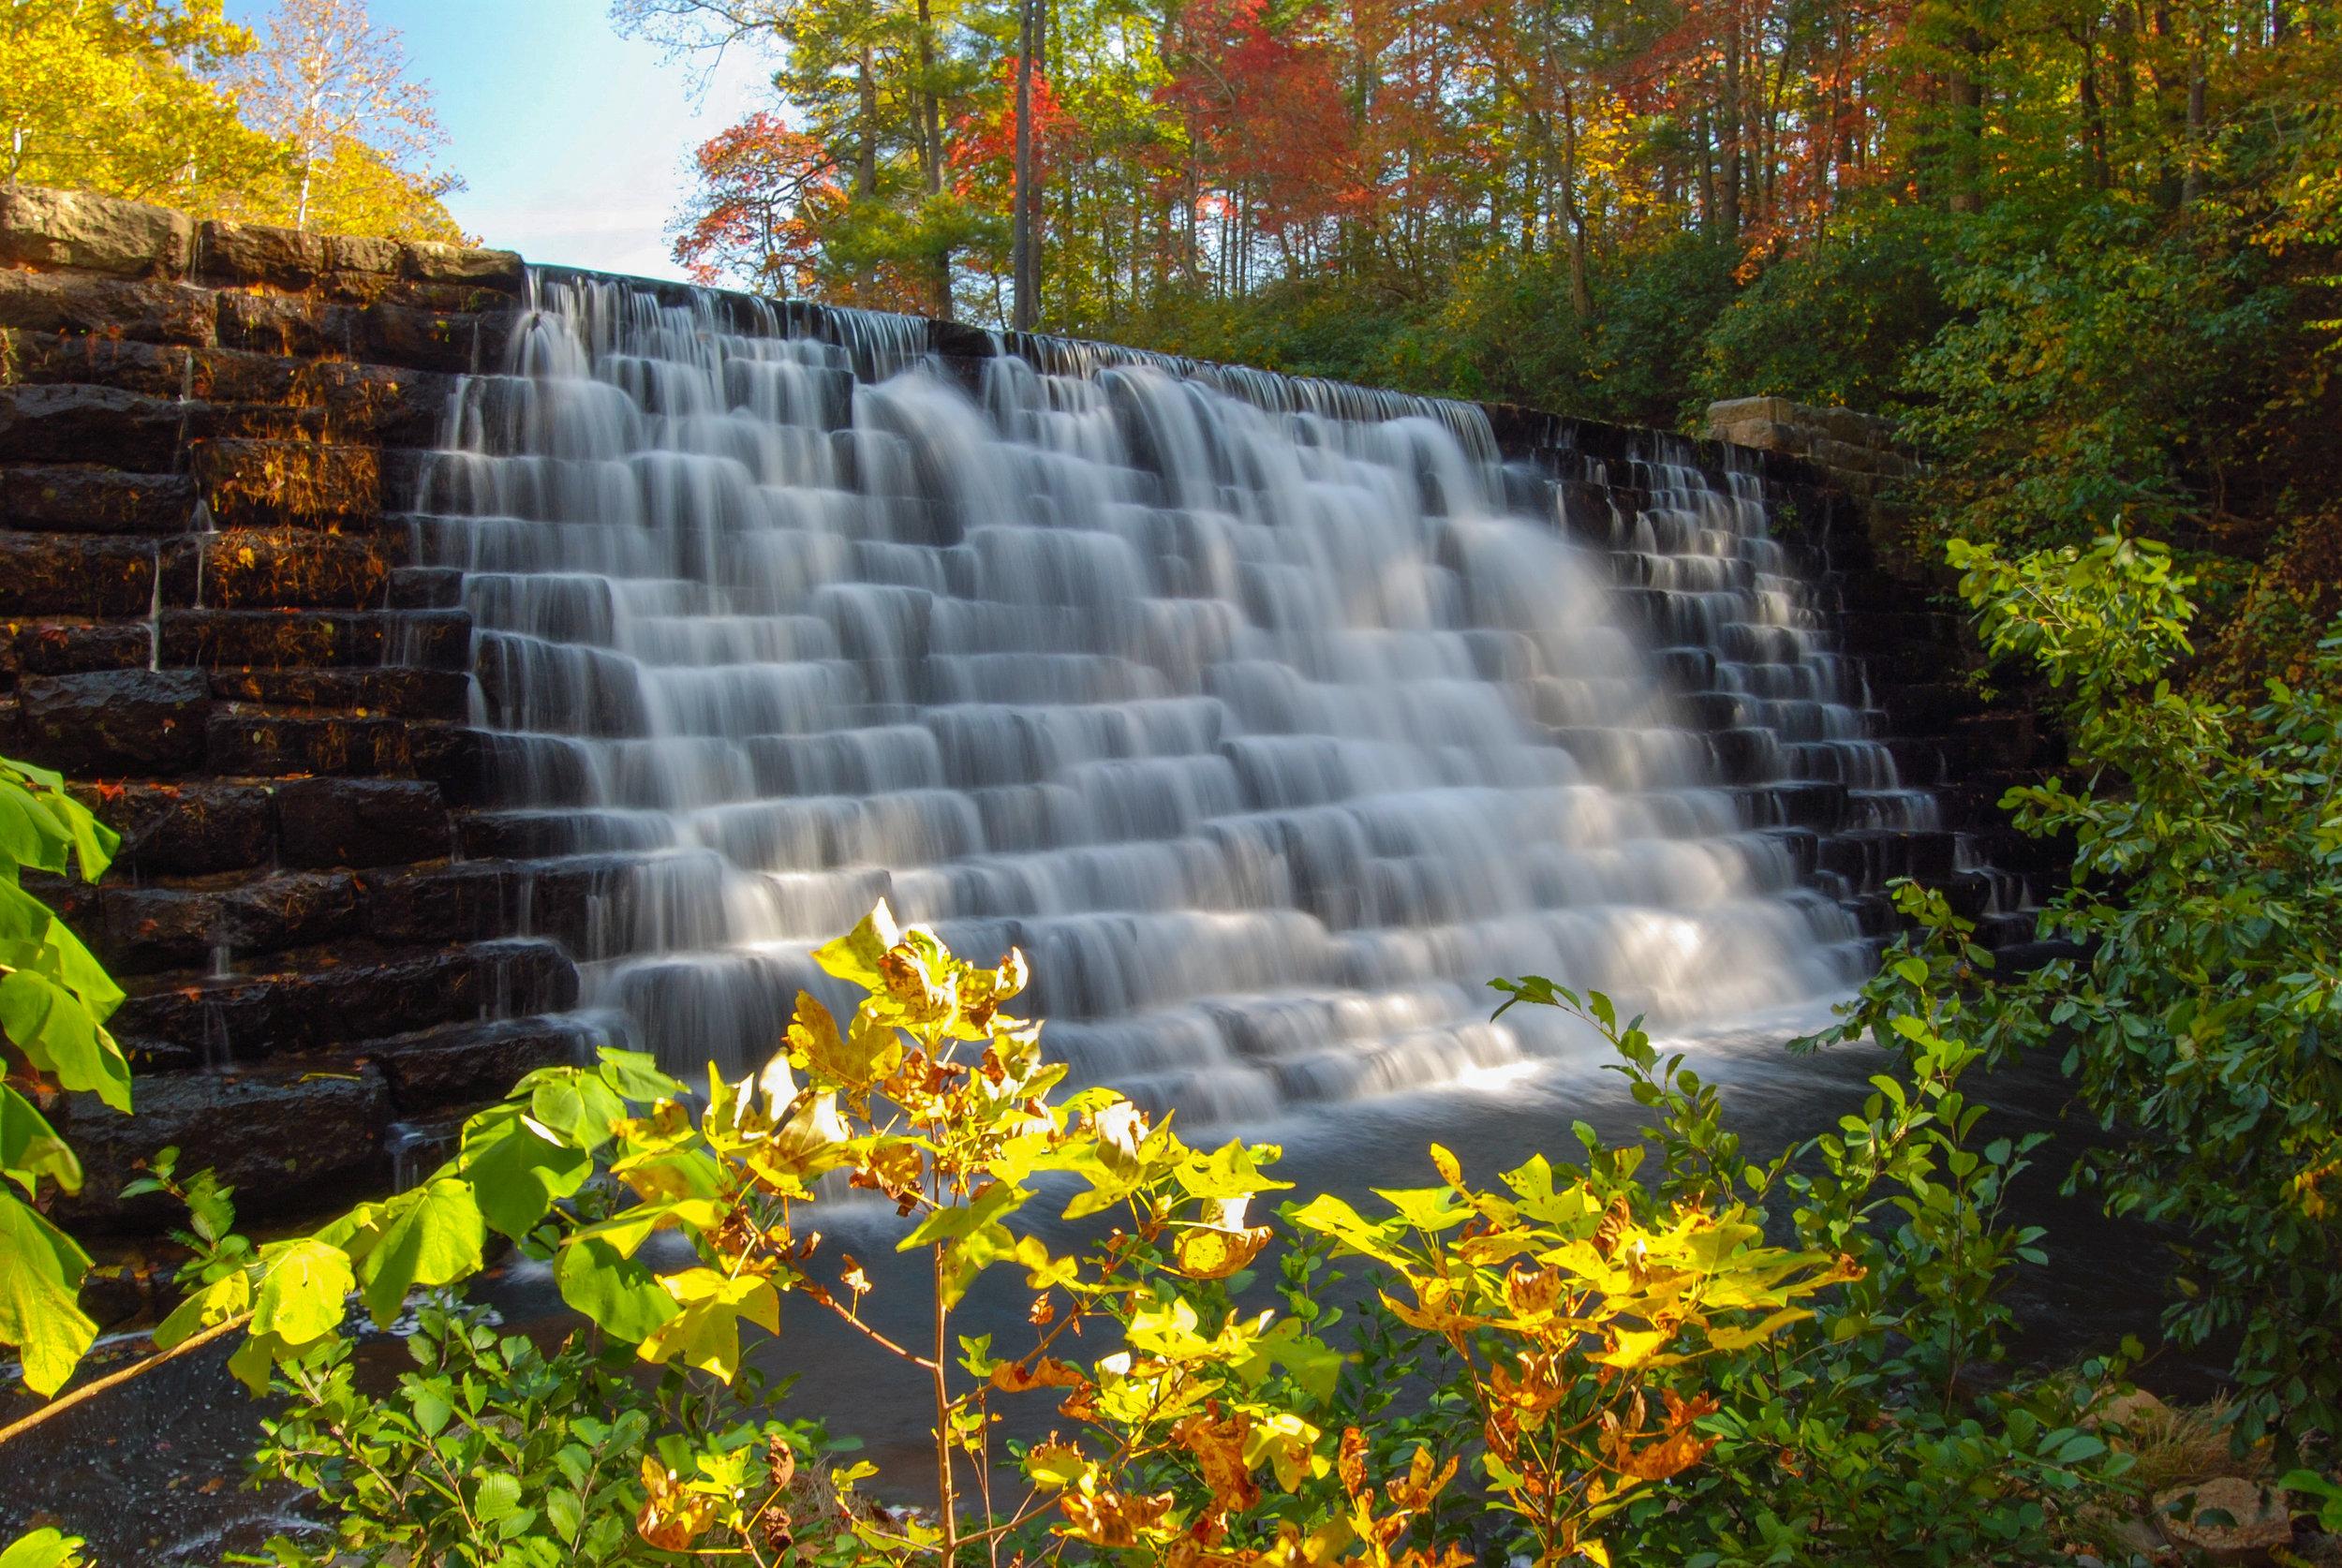 otter crek falls-blue ridge parkway-fall-autumn-virginia.jpg